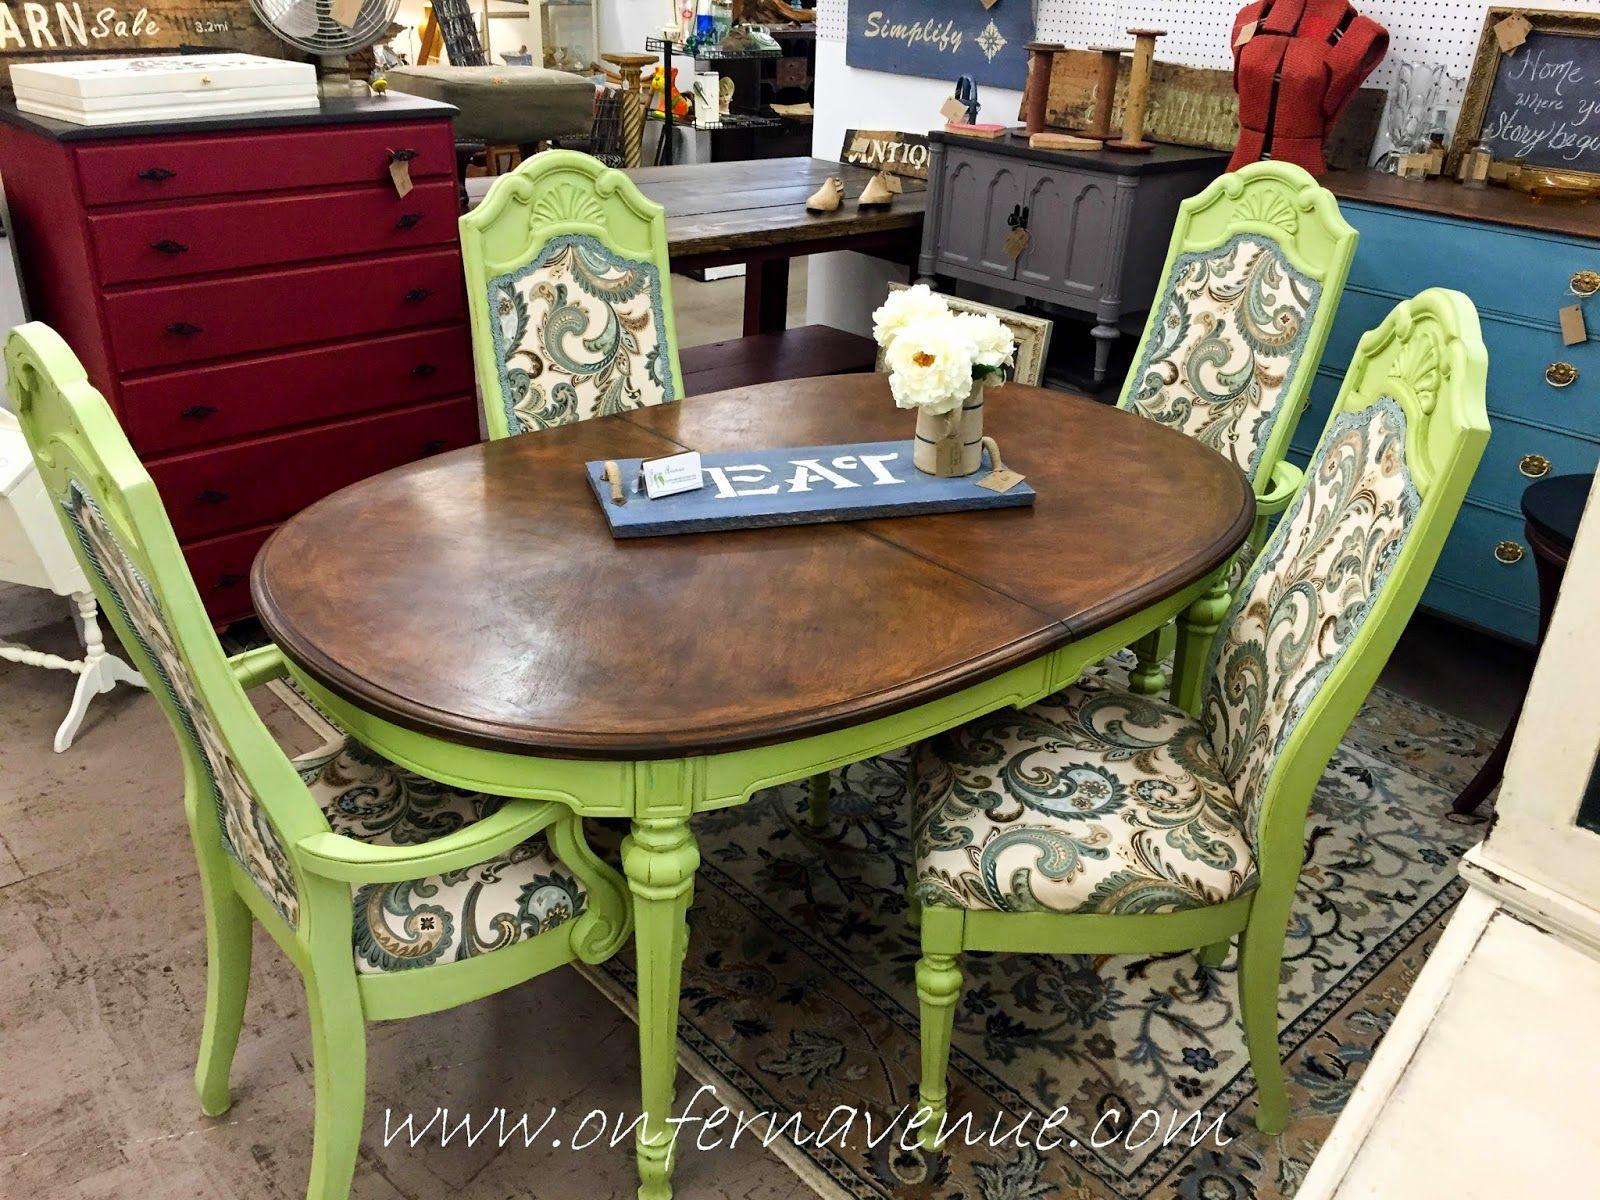 Remarkable 30 Inspiration Photo Of Dining Room Repurpose Flea Market Unemploymentrelief Wooden Chair Designs For Living Room Unemploymentrelieforg